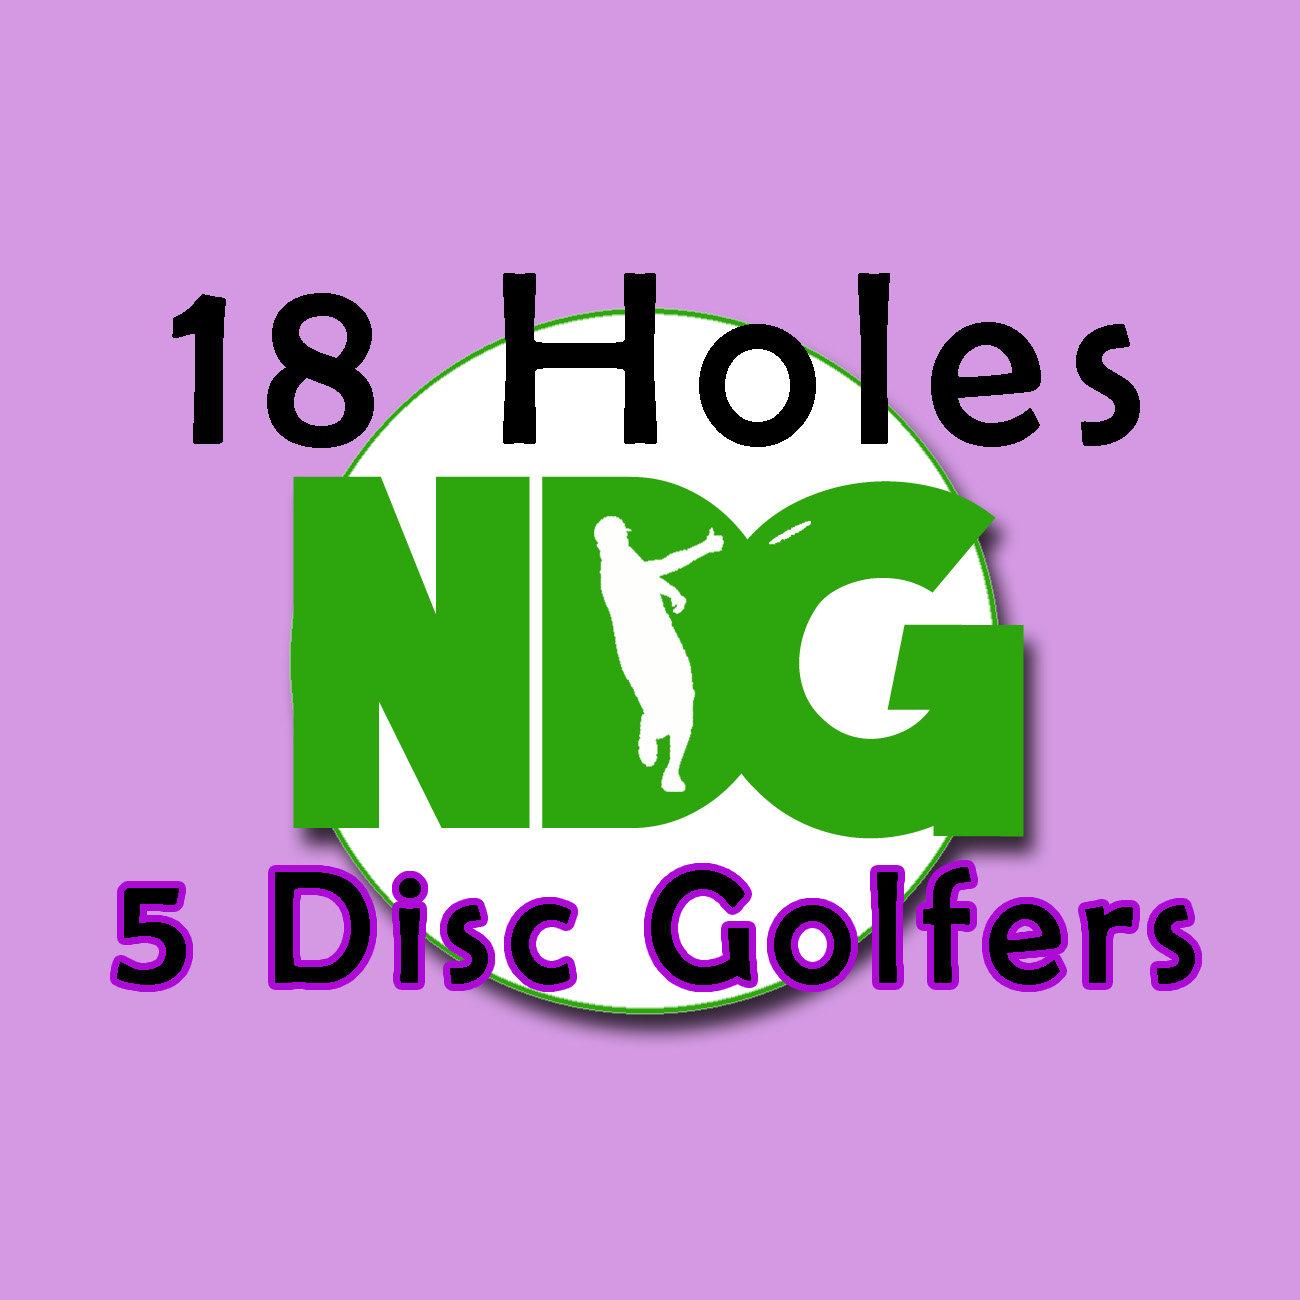 18 Holes: 5 Disc Golfers